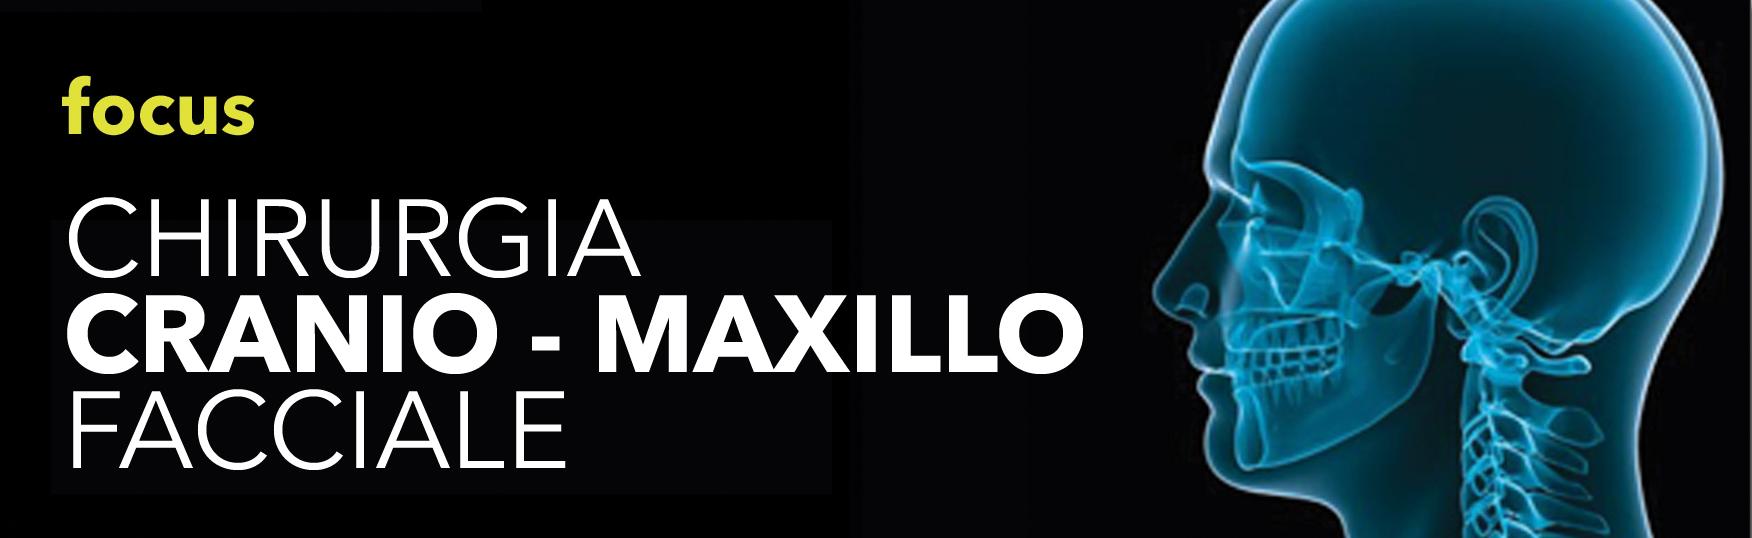 focus-maxillo